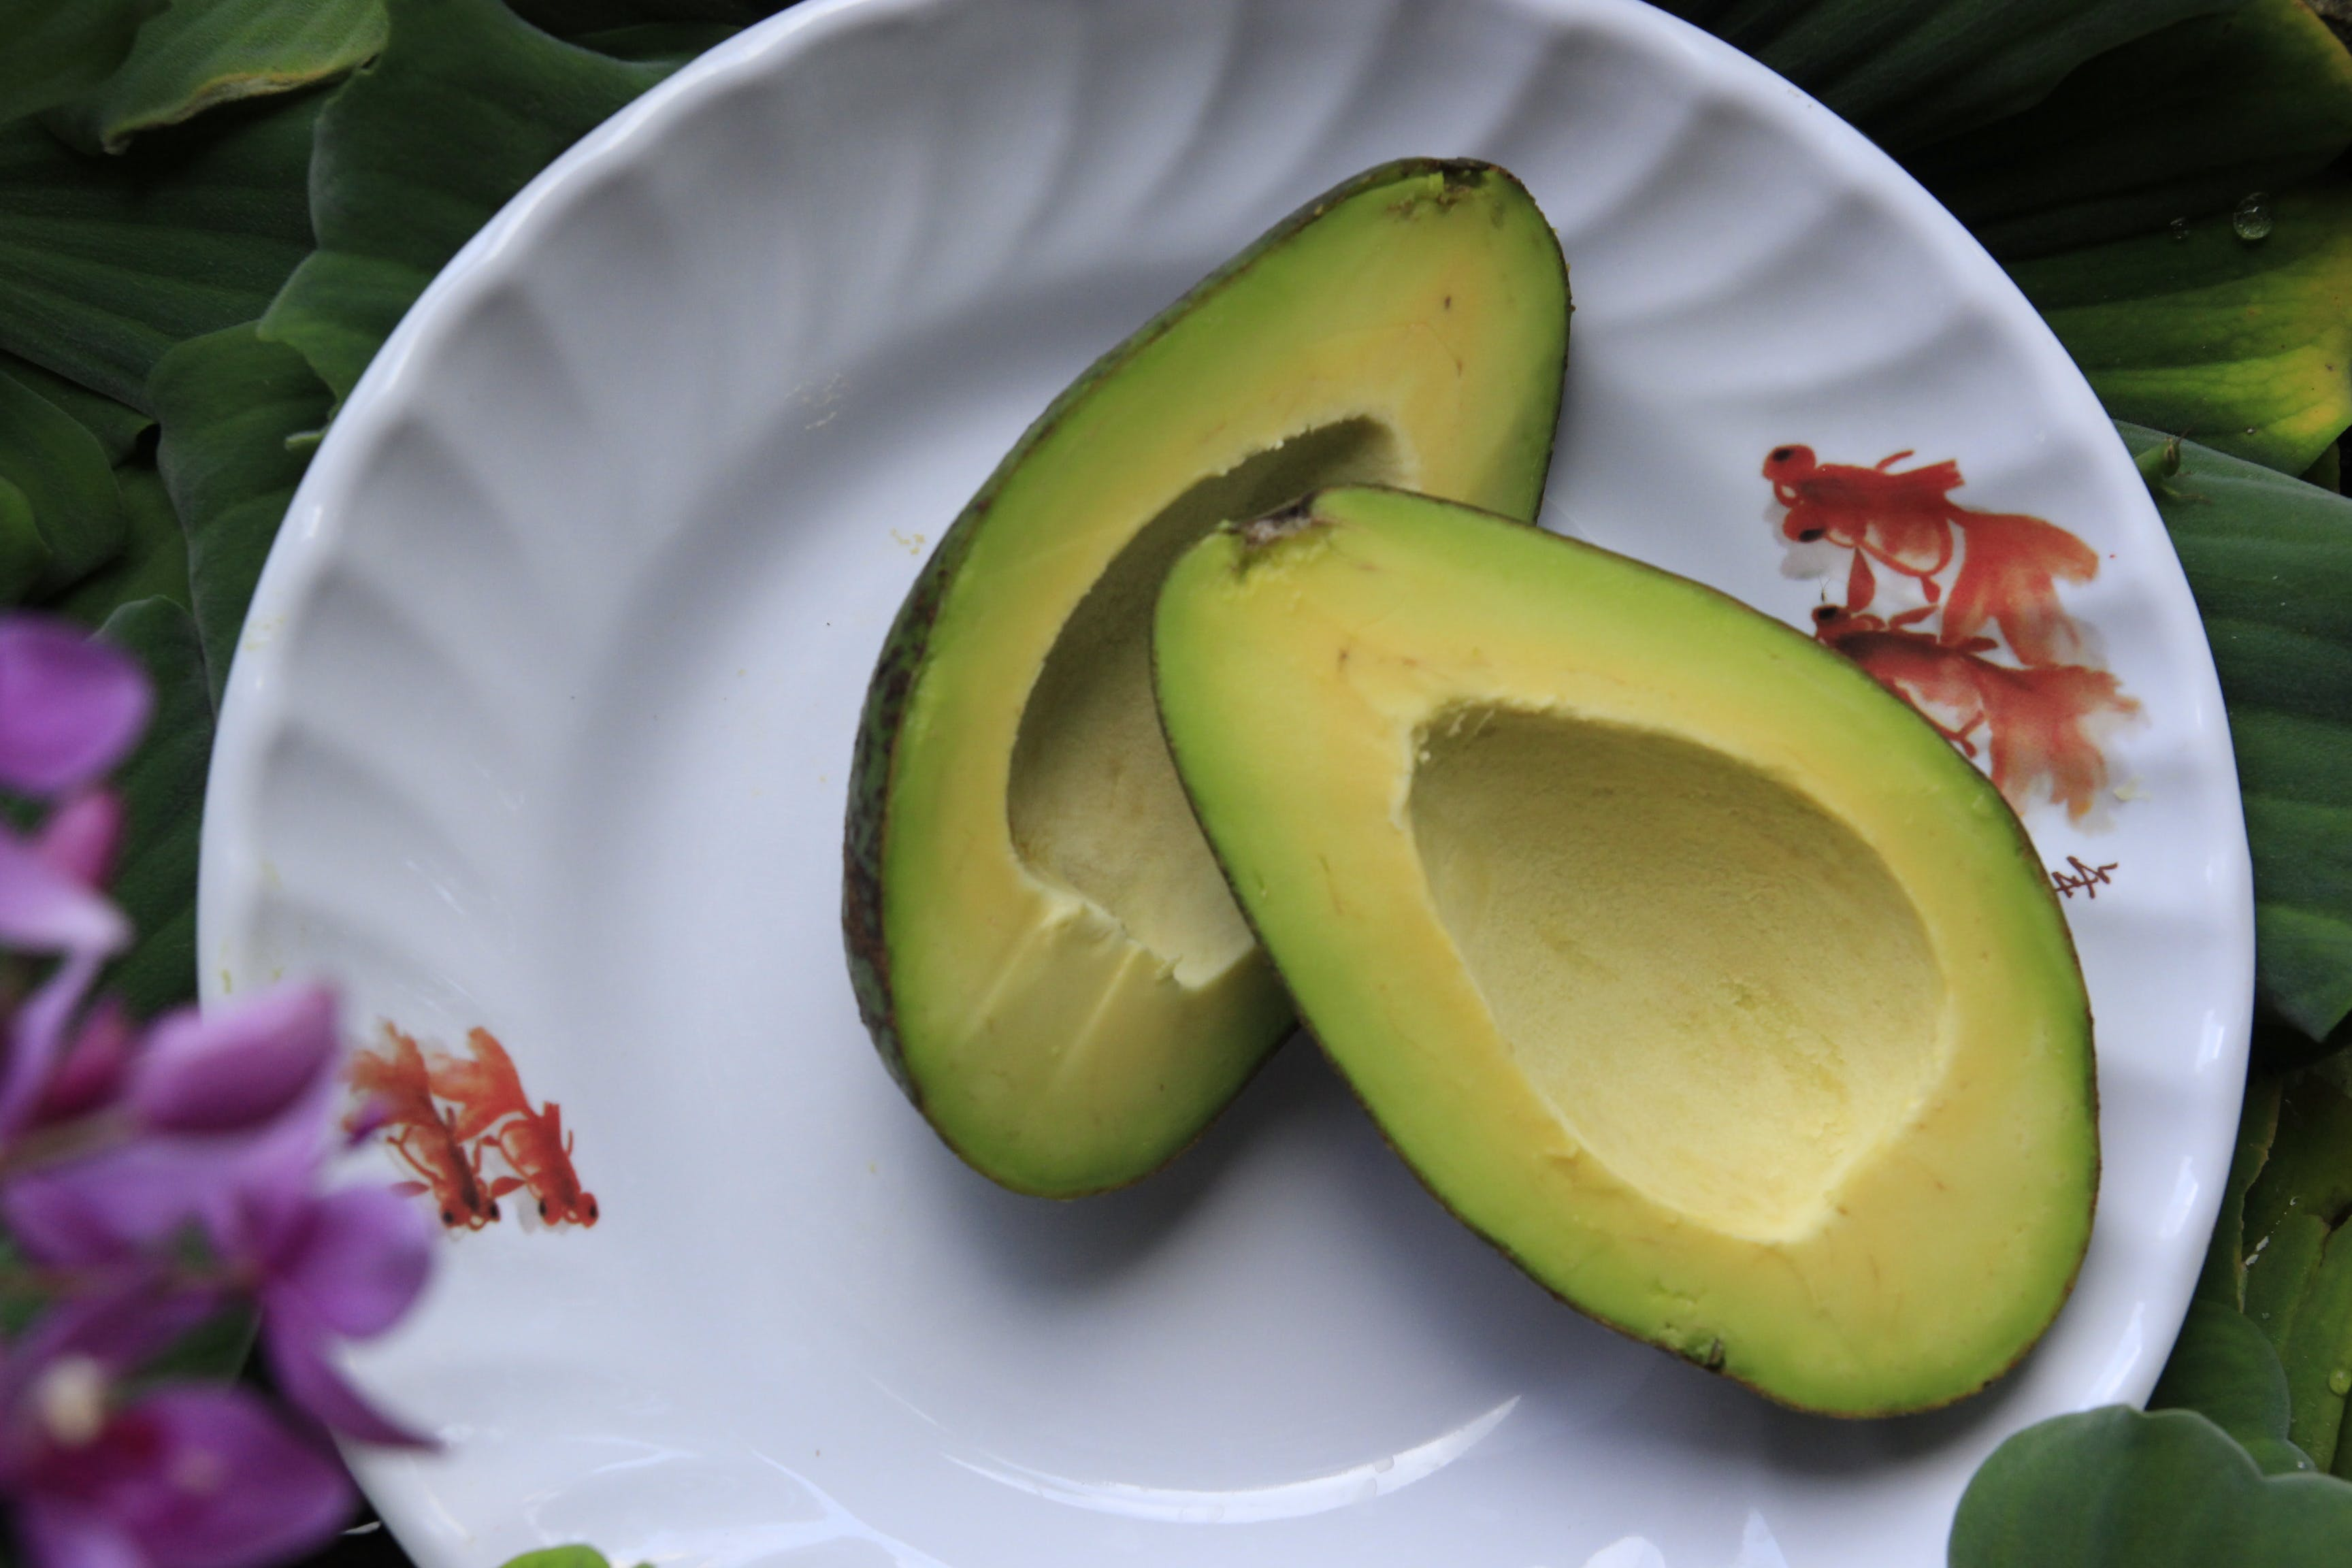 Sliced Avocado Fruits on Round White Ceramic Plate